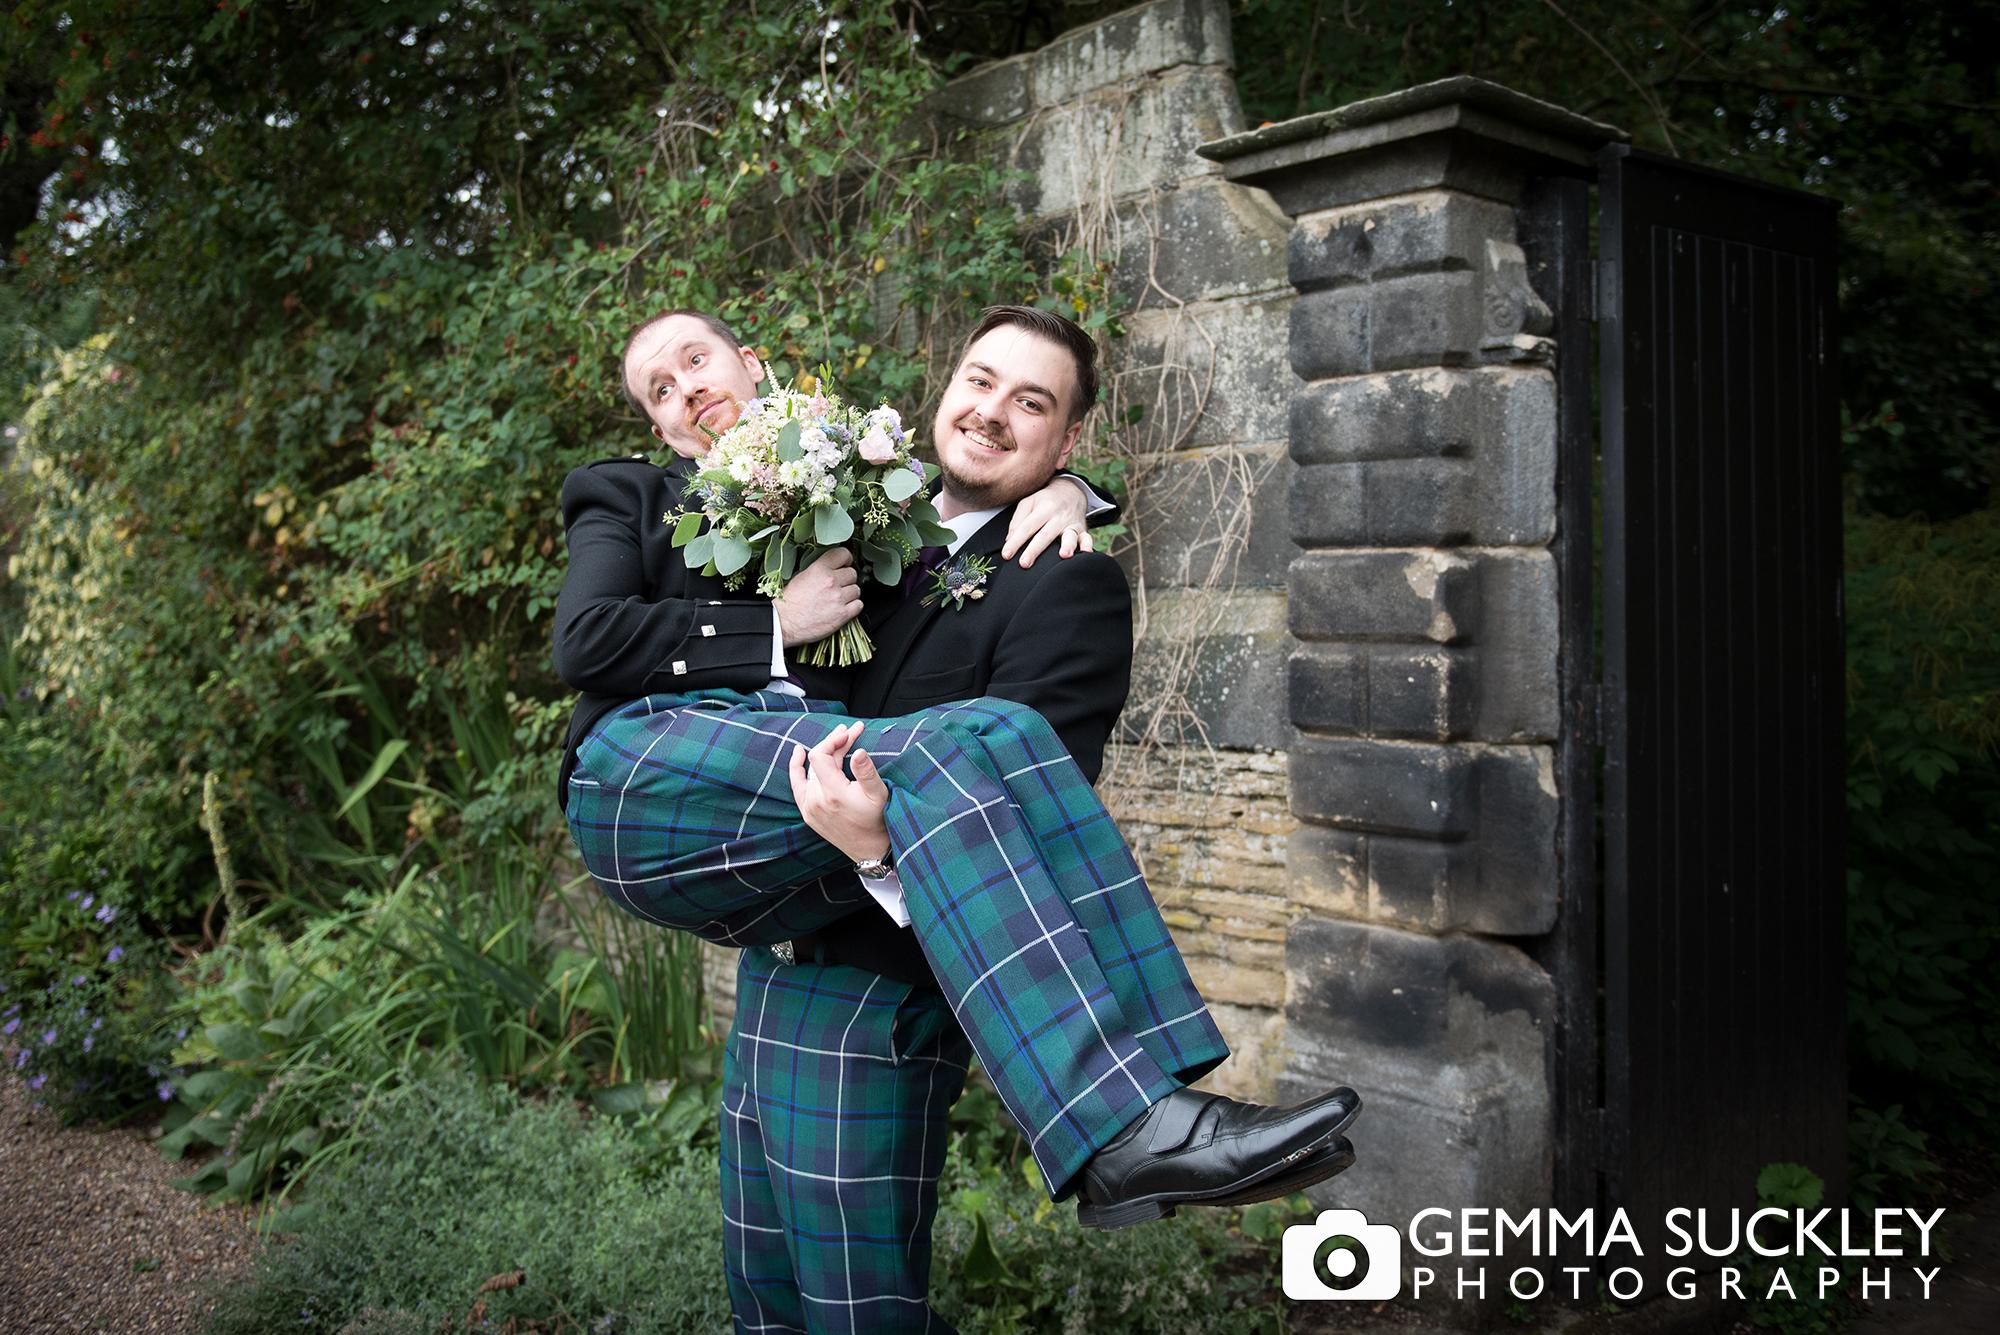 east-rddlesden-hall-wedding-photographer.jpg